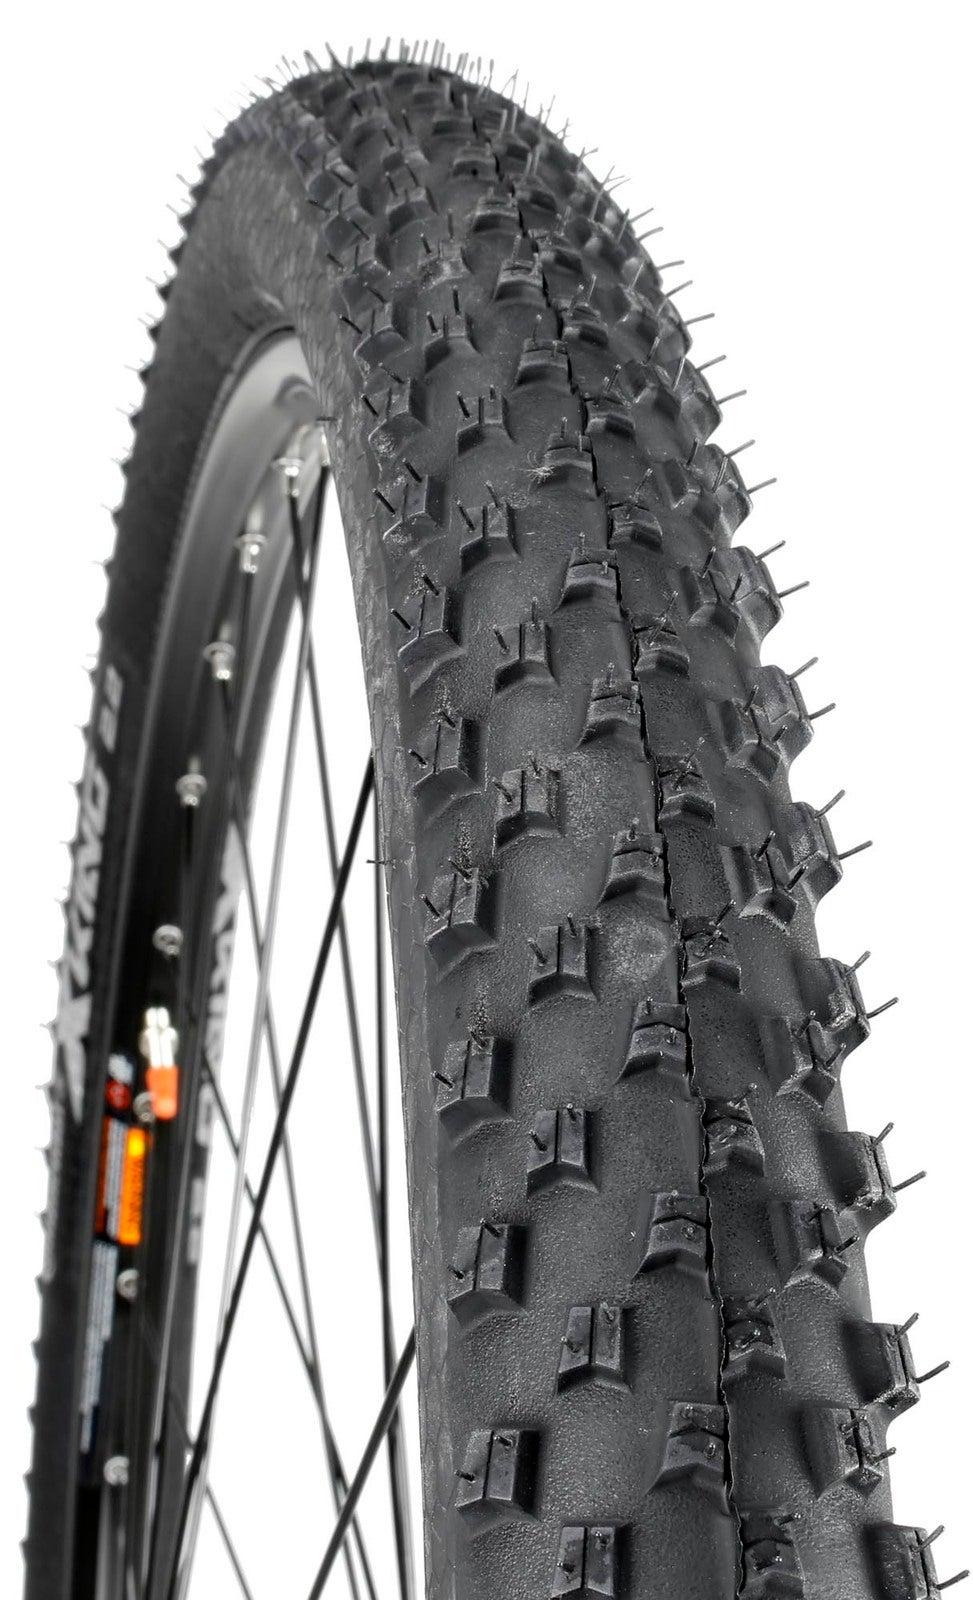 Mavic Road Bike Bicycle Novatec Hubs Continental Tyres 700C 11S Wheelset